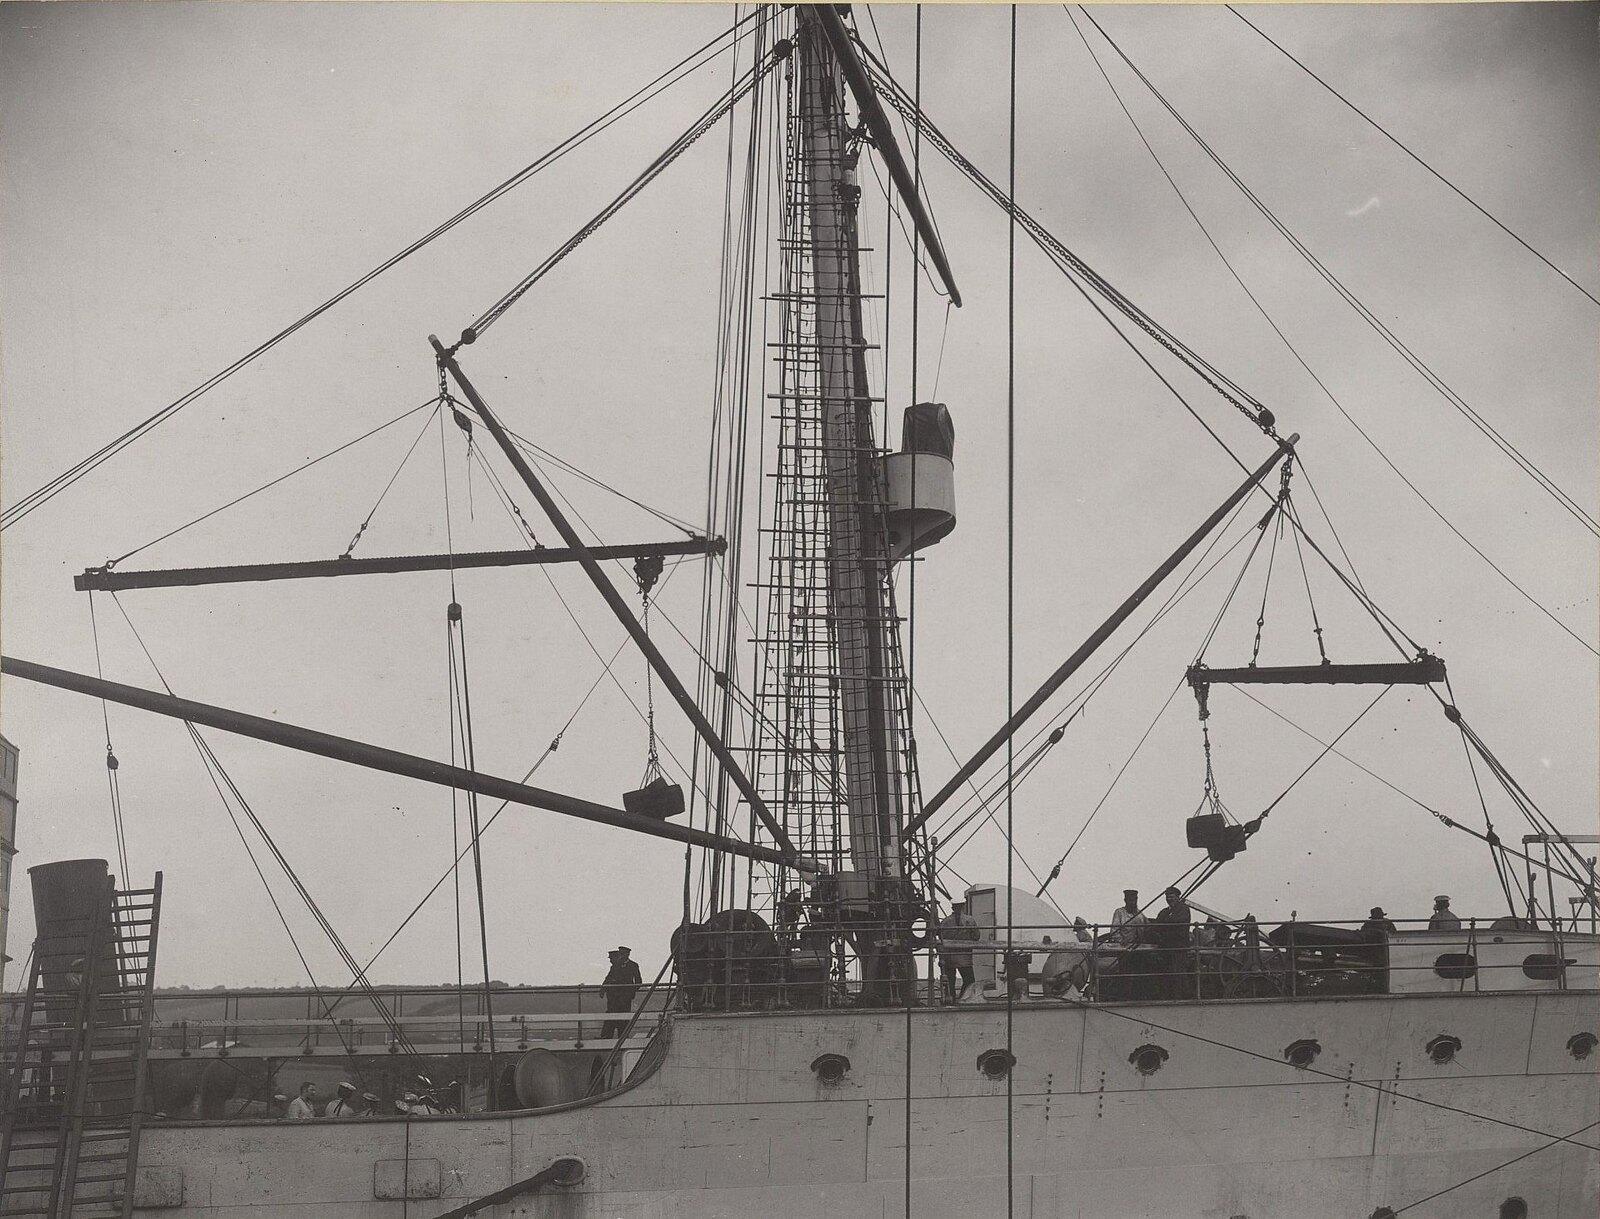 23. На борту учебного судна «Океан». 1901-1902 гг.